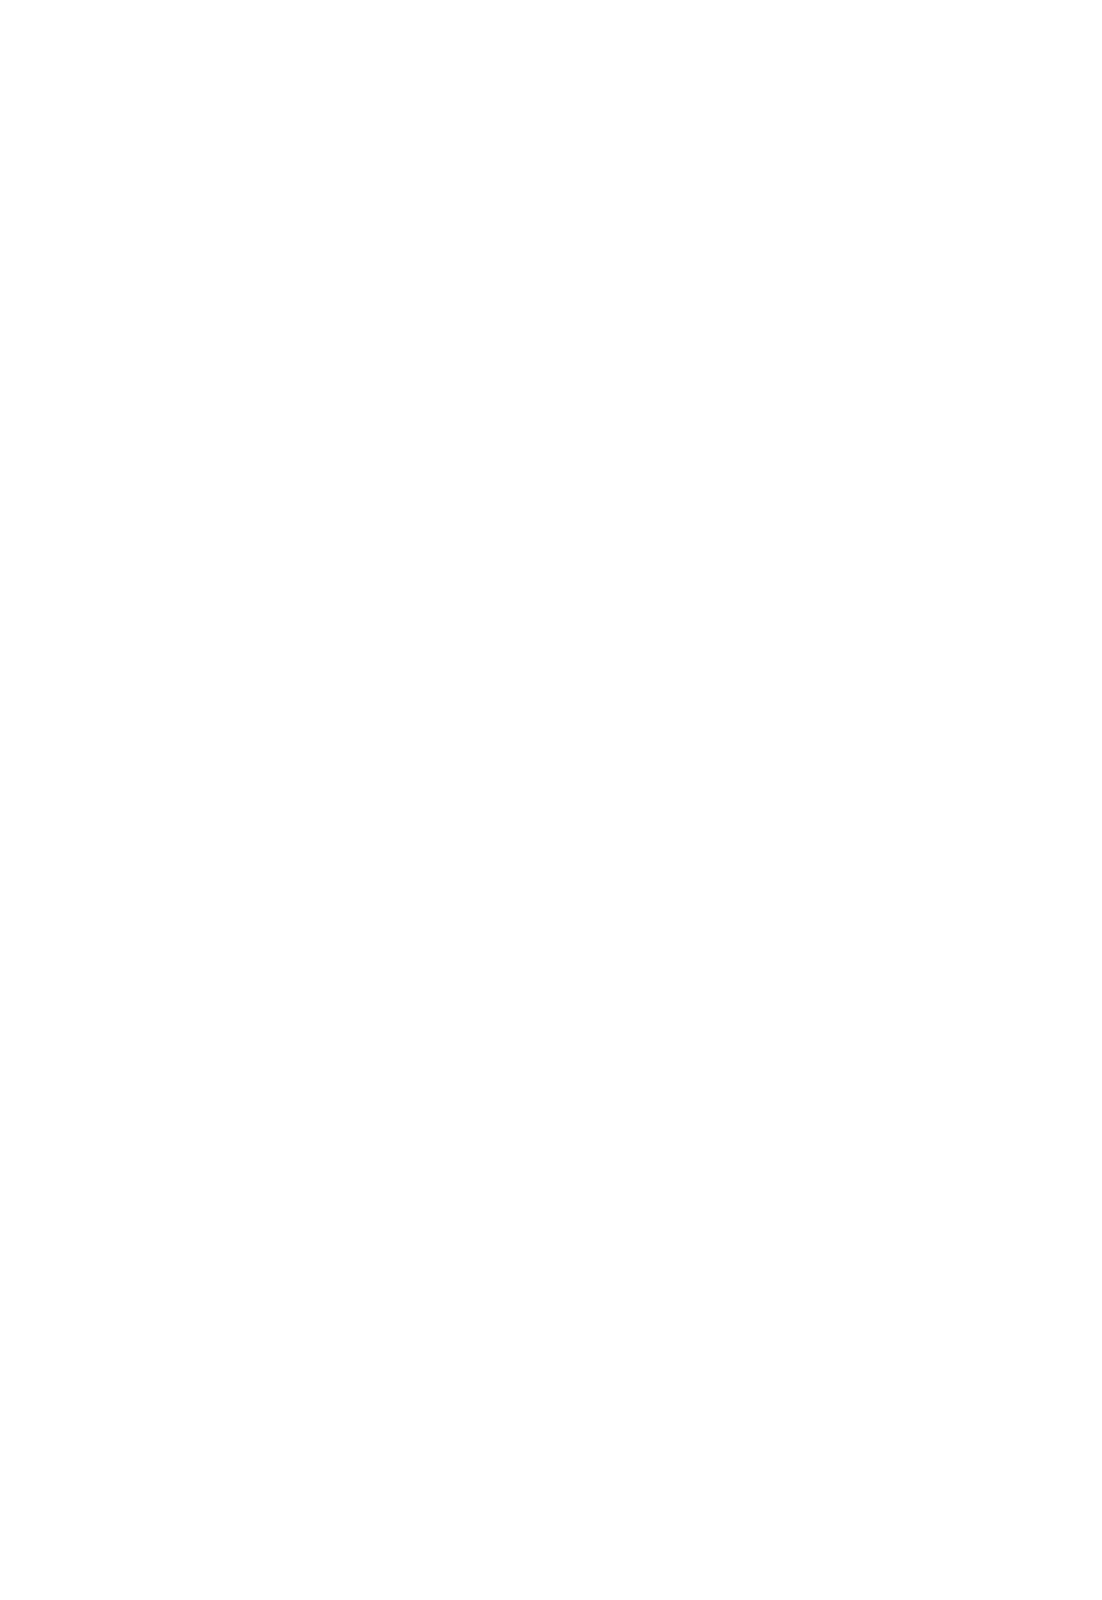 [Misao.] Hajimete Janai yo?   It's not Your First Time? [English] {5 a.m.} + [Rin] 4